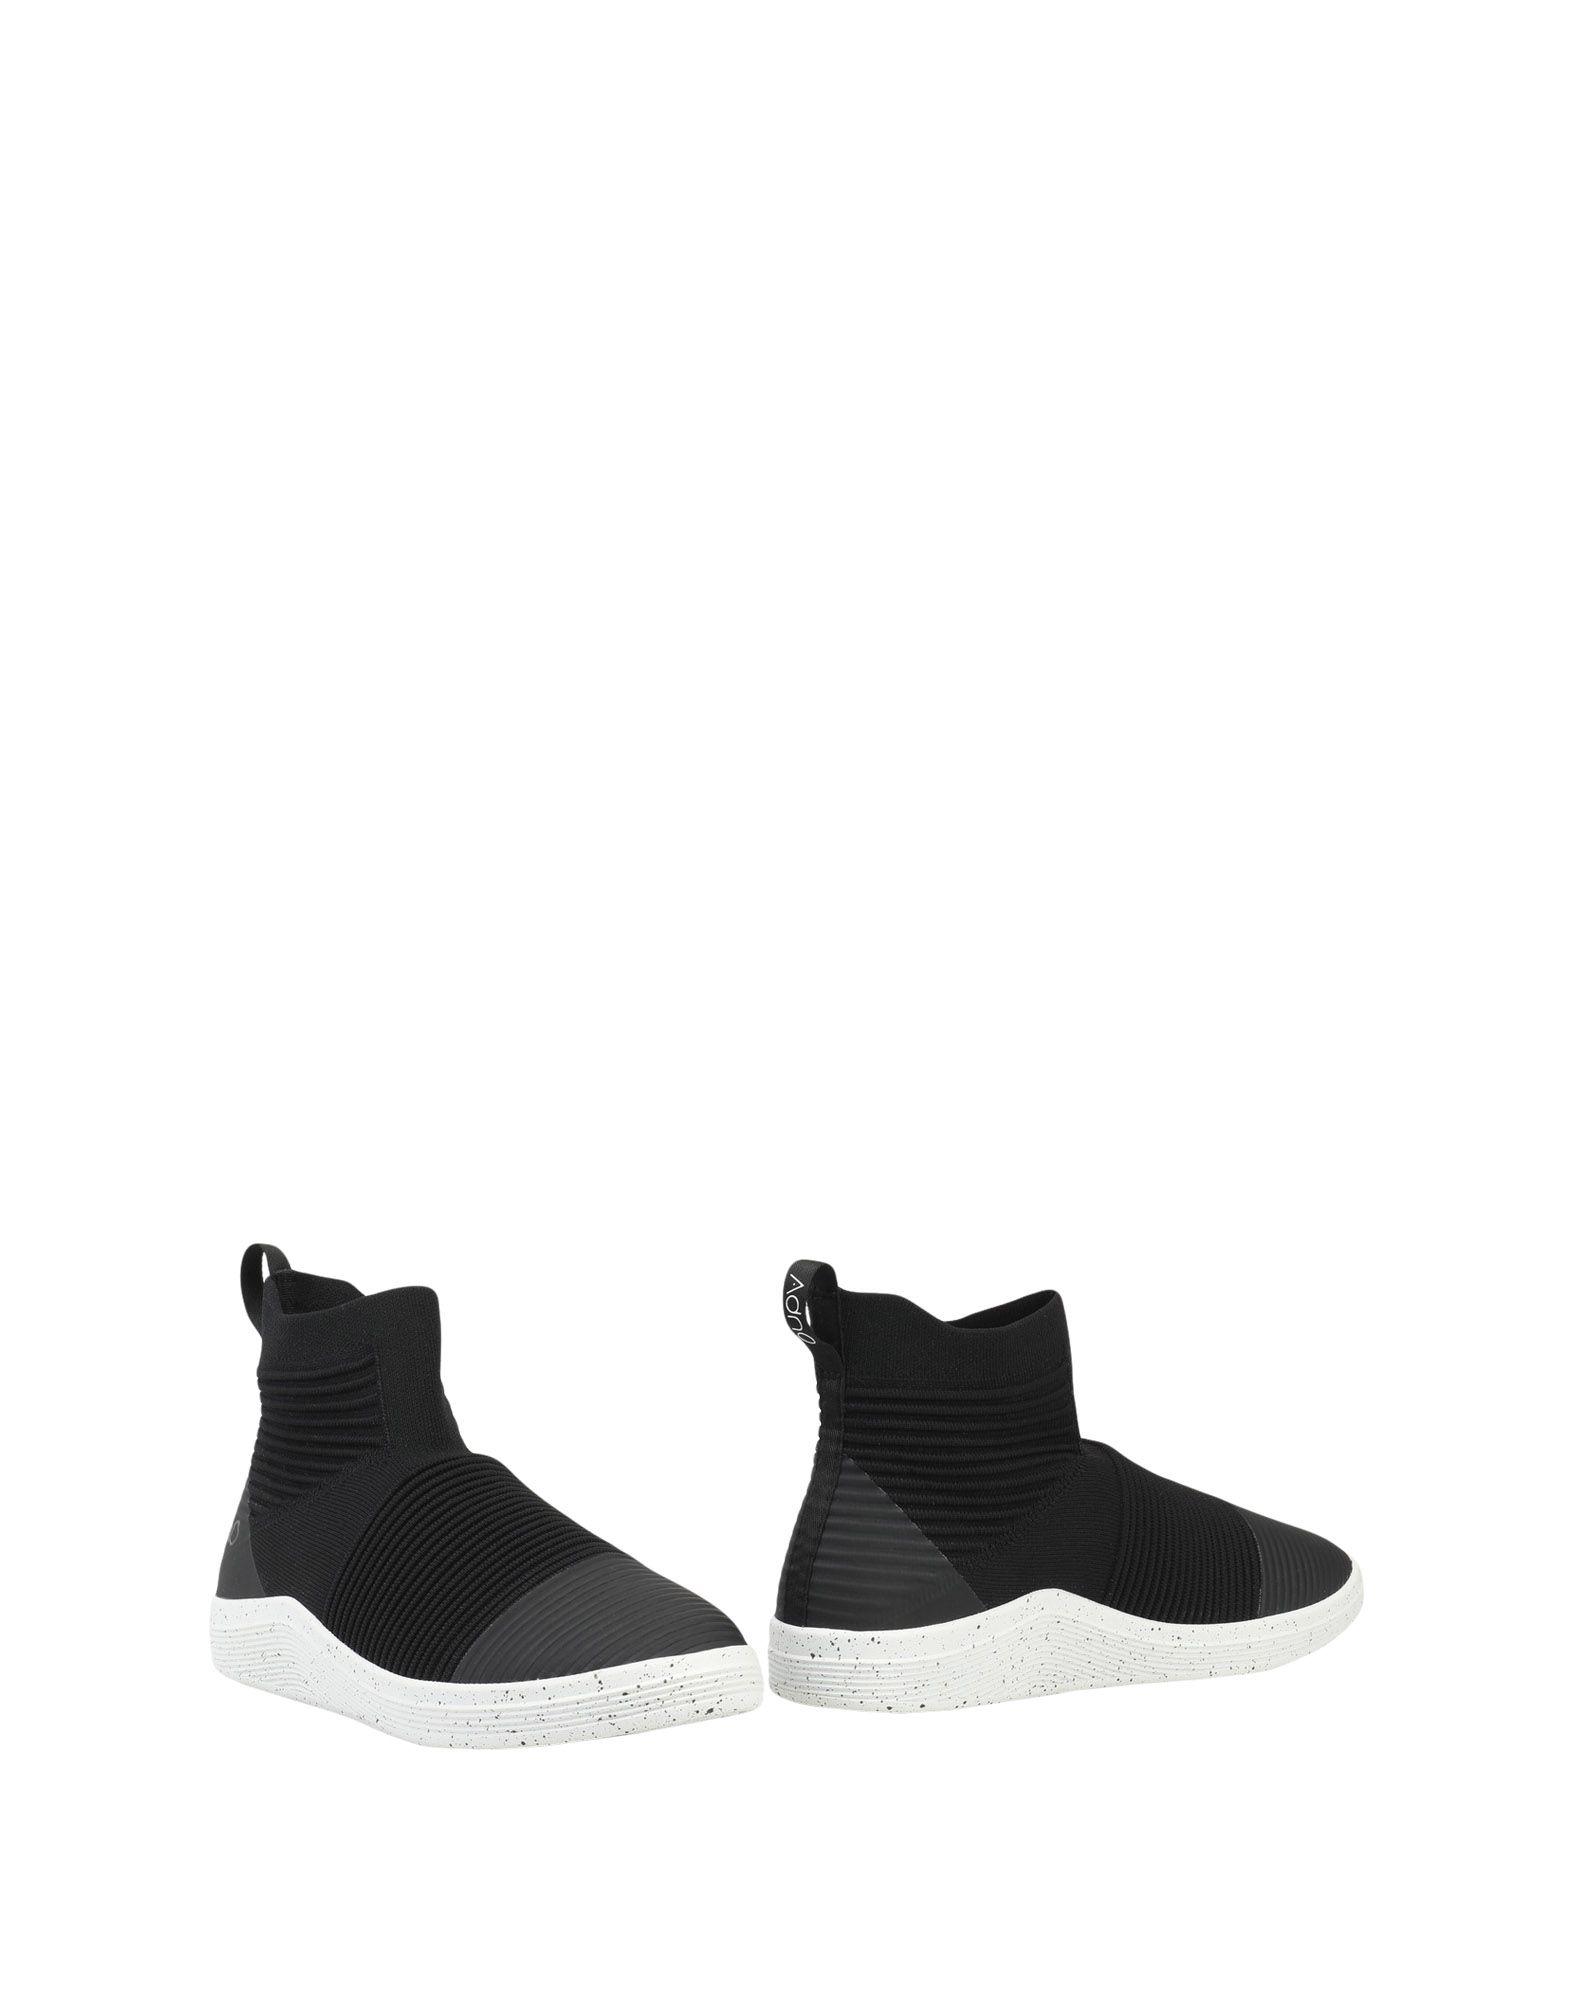 Adno® Ao Rib 5.10 - Boots - Men Adno® Adno® Adno® Boots online on  Australia - 11340482DR 469369